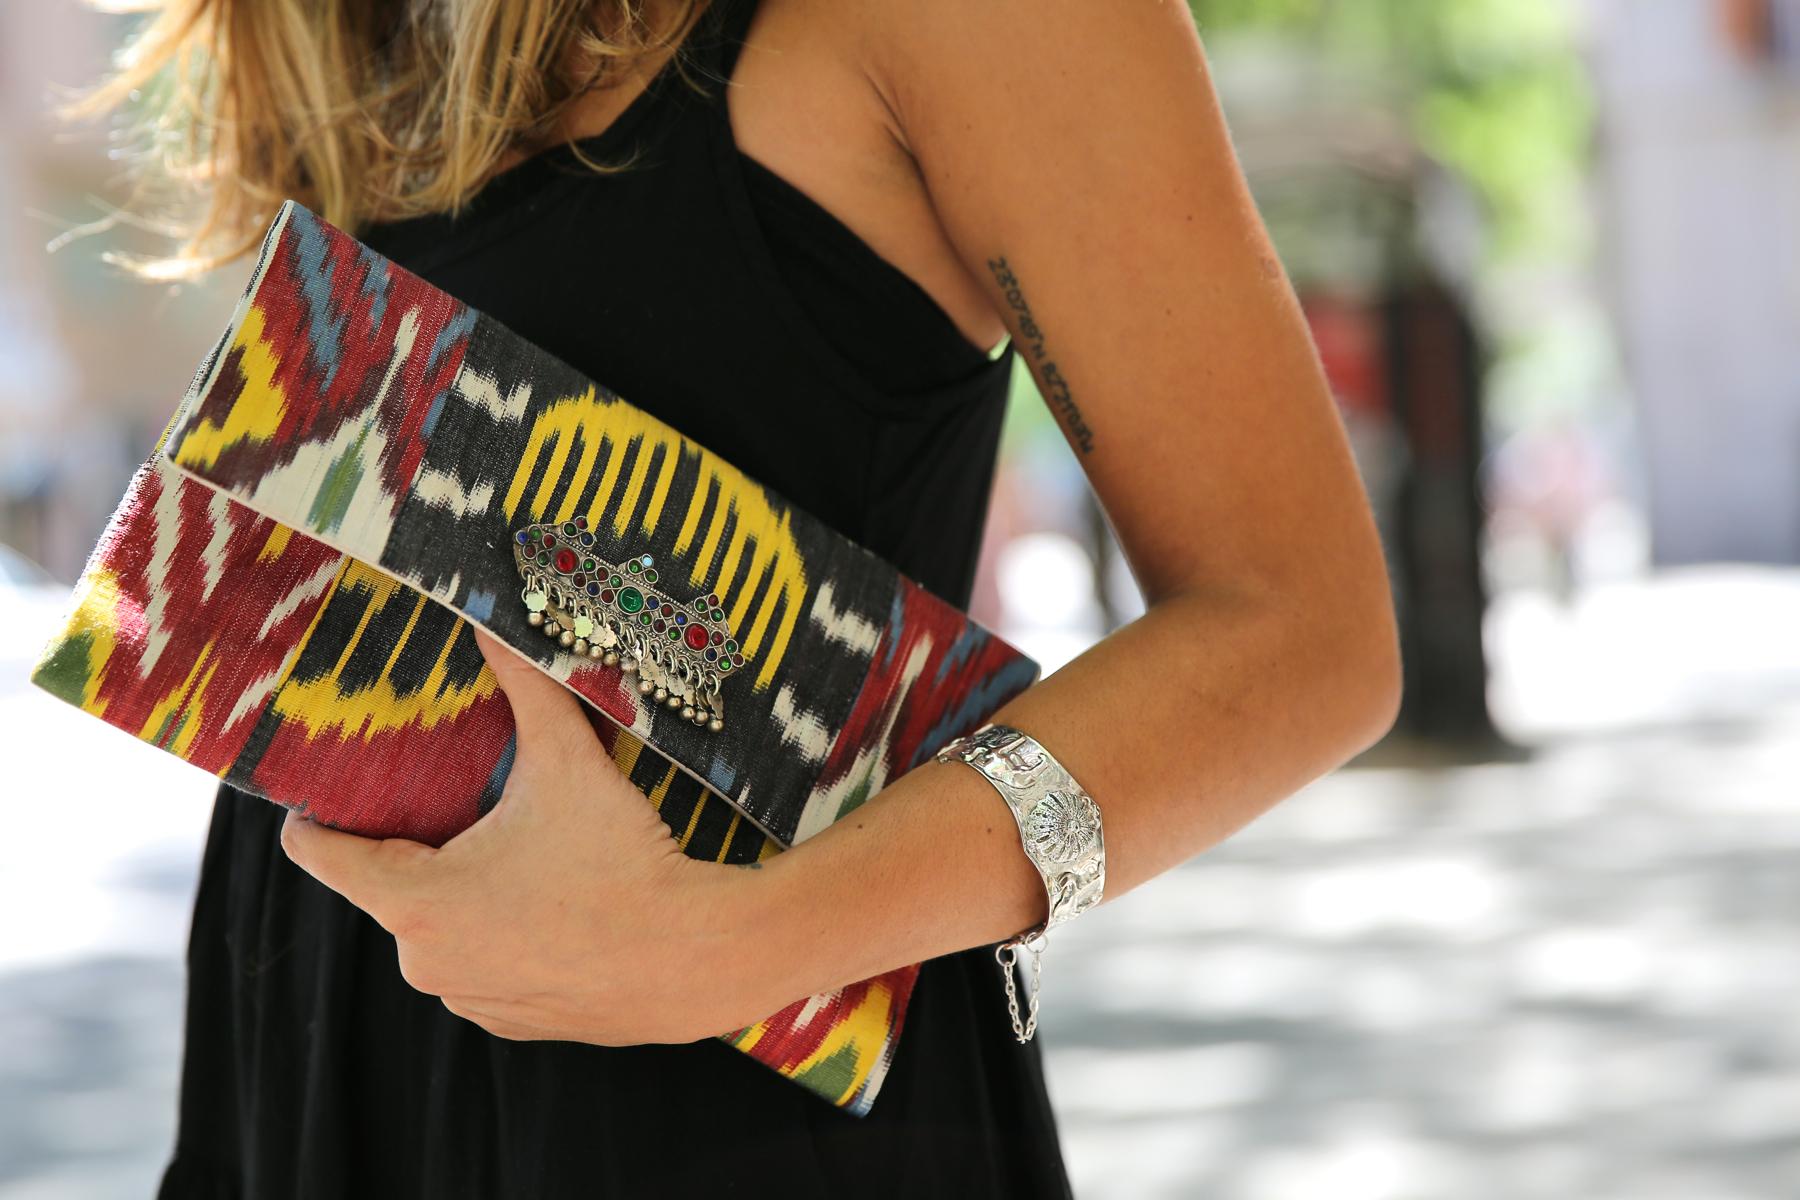 trendy_taste-look-outfit-street_style-ootd-blog-blogger-fashion_spain-moda_españa-ugg_australia-clutch_etnico-vestido_negro-black_dress-brandy_melville-2